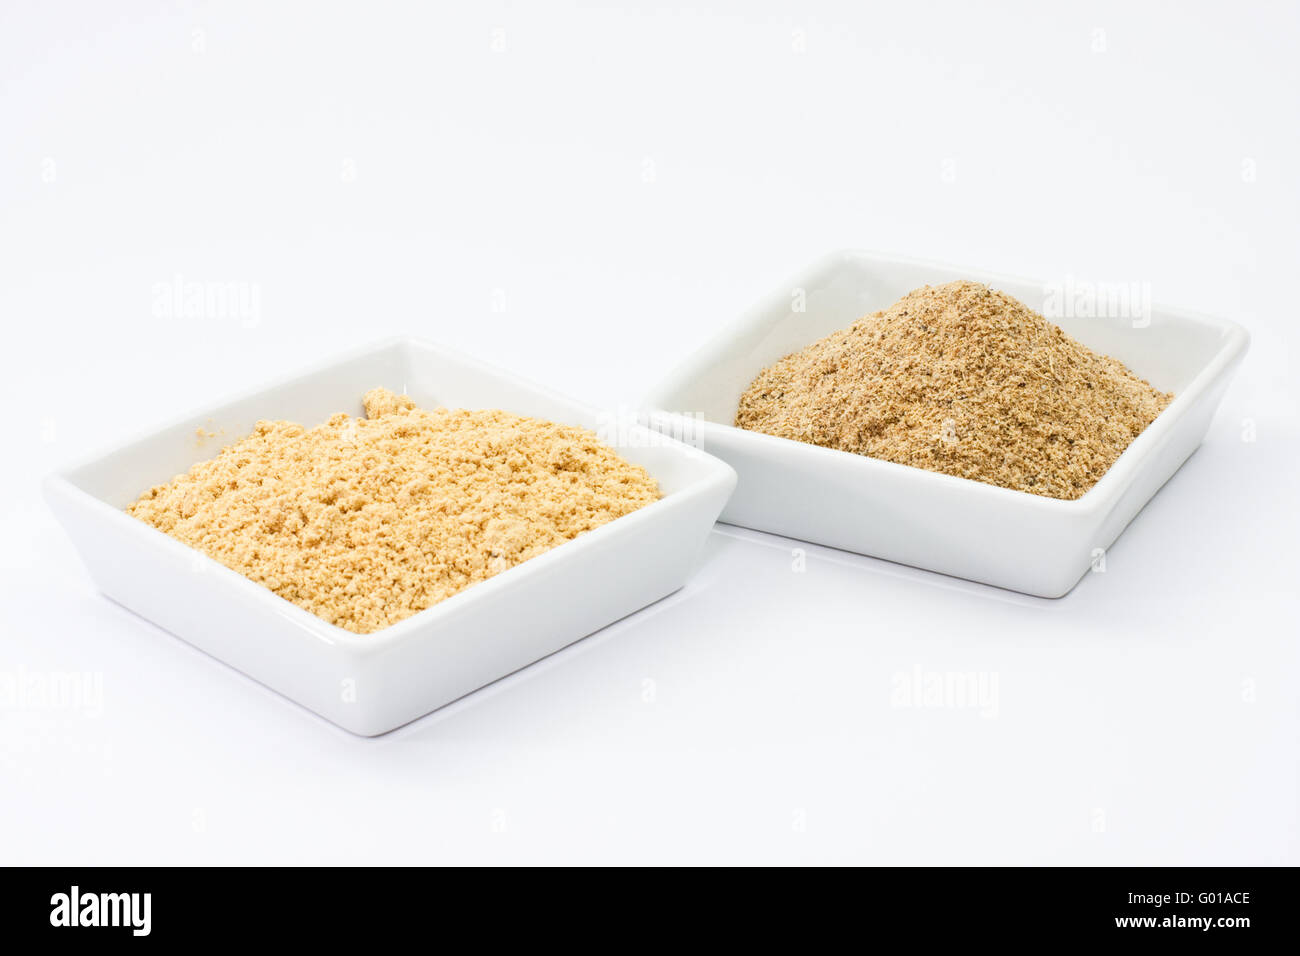 Kardamompulver und Ingwerpulver, cardamom powder and ginger powder - Stock Image